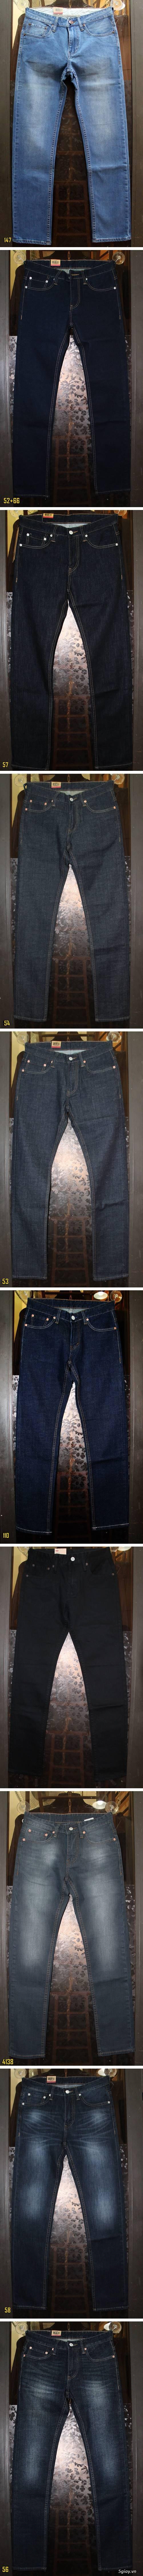 Shop285.com - Shop quần áo : Zara,Jules,Jake*s,,Hollister,Aber,CK,Tommy,Levis - 39